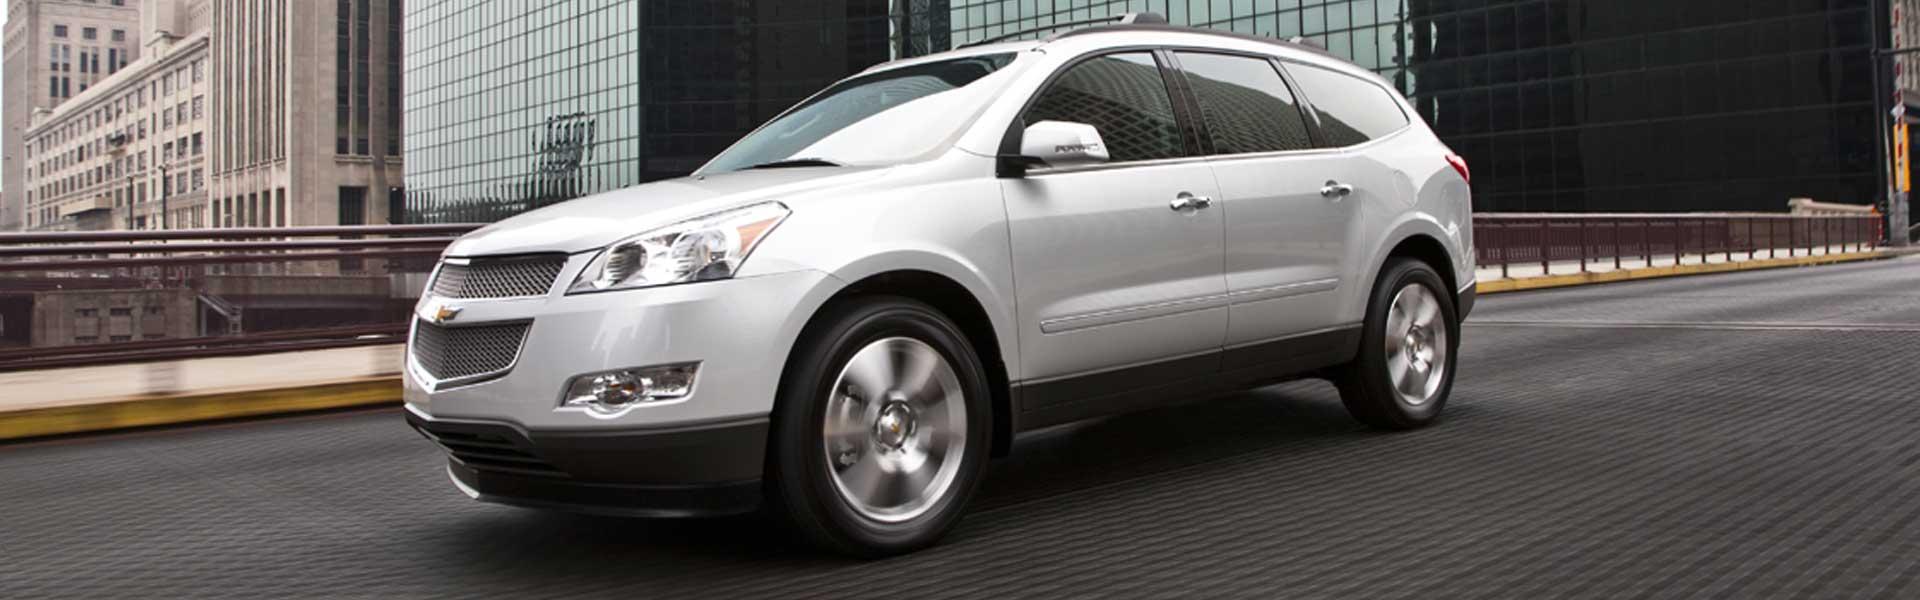 Guaranteed Auto Sales >> Rpm Auto Sales Wholesale Car Dealer In Flint Mi